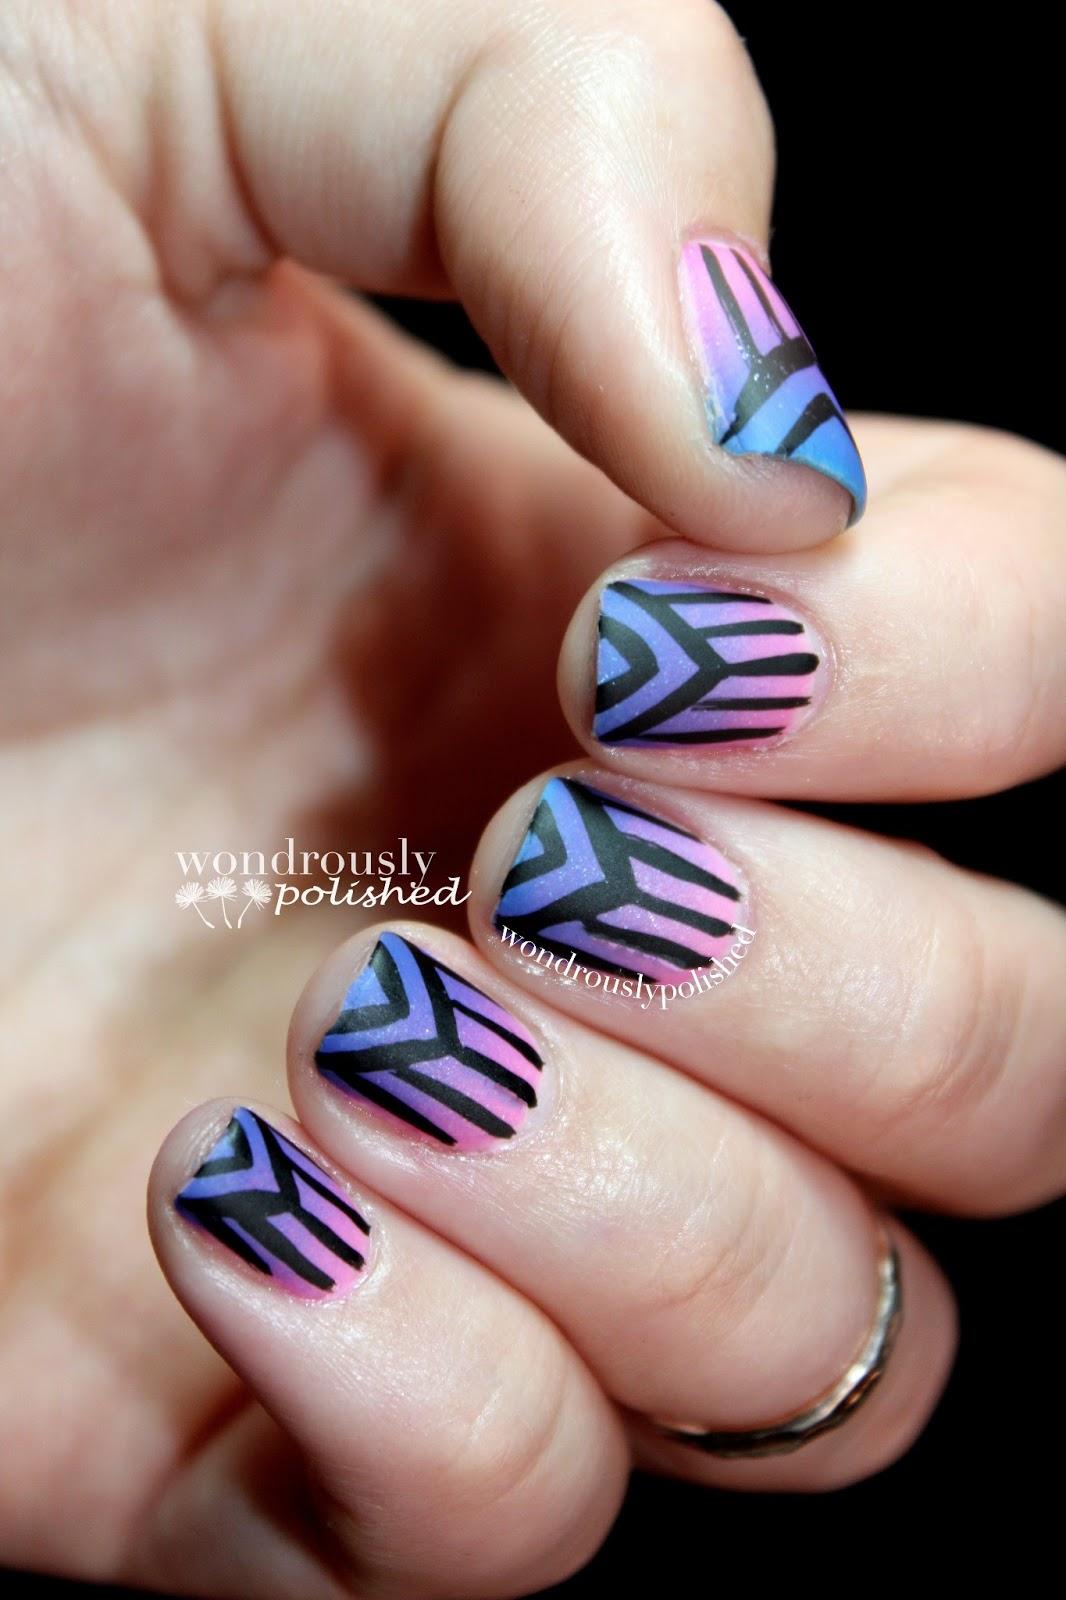 Wondrously Polished April Nail Art Challenge: Wondrously Polished: Gradient And Some Free Hand Stripes